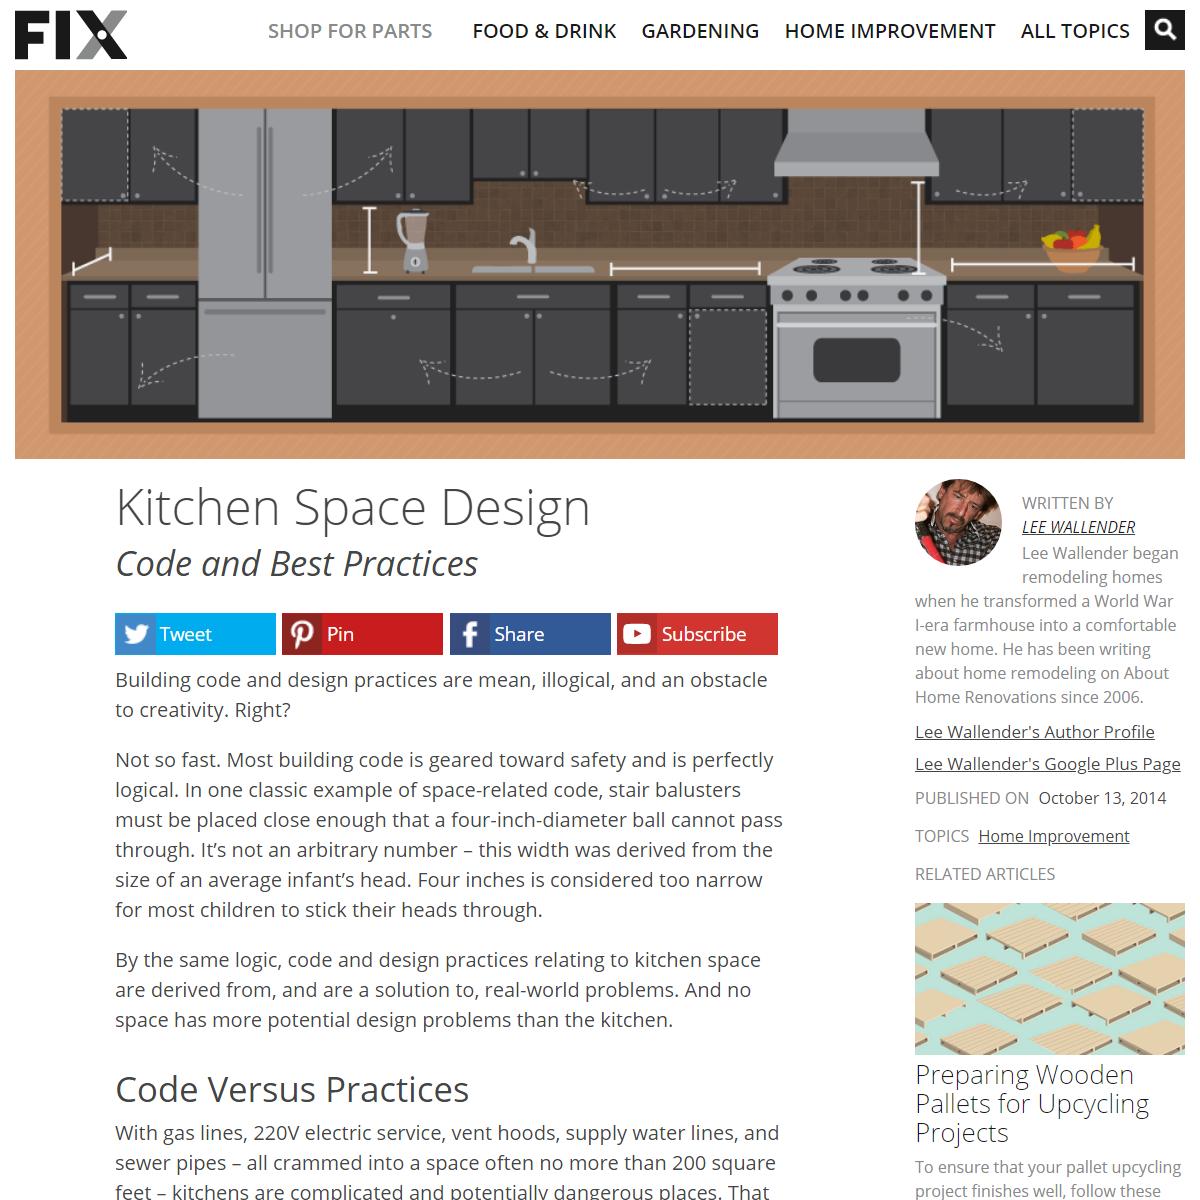 Best Practices for Kitchen Space Design - Fix.com